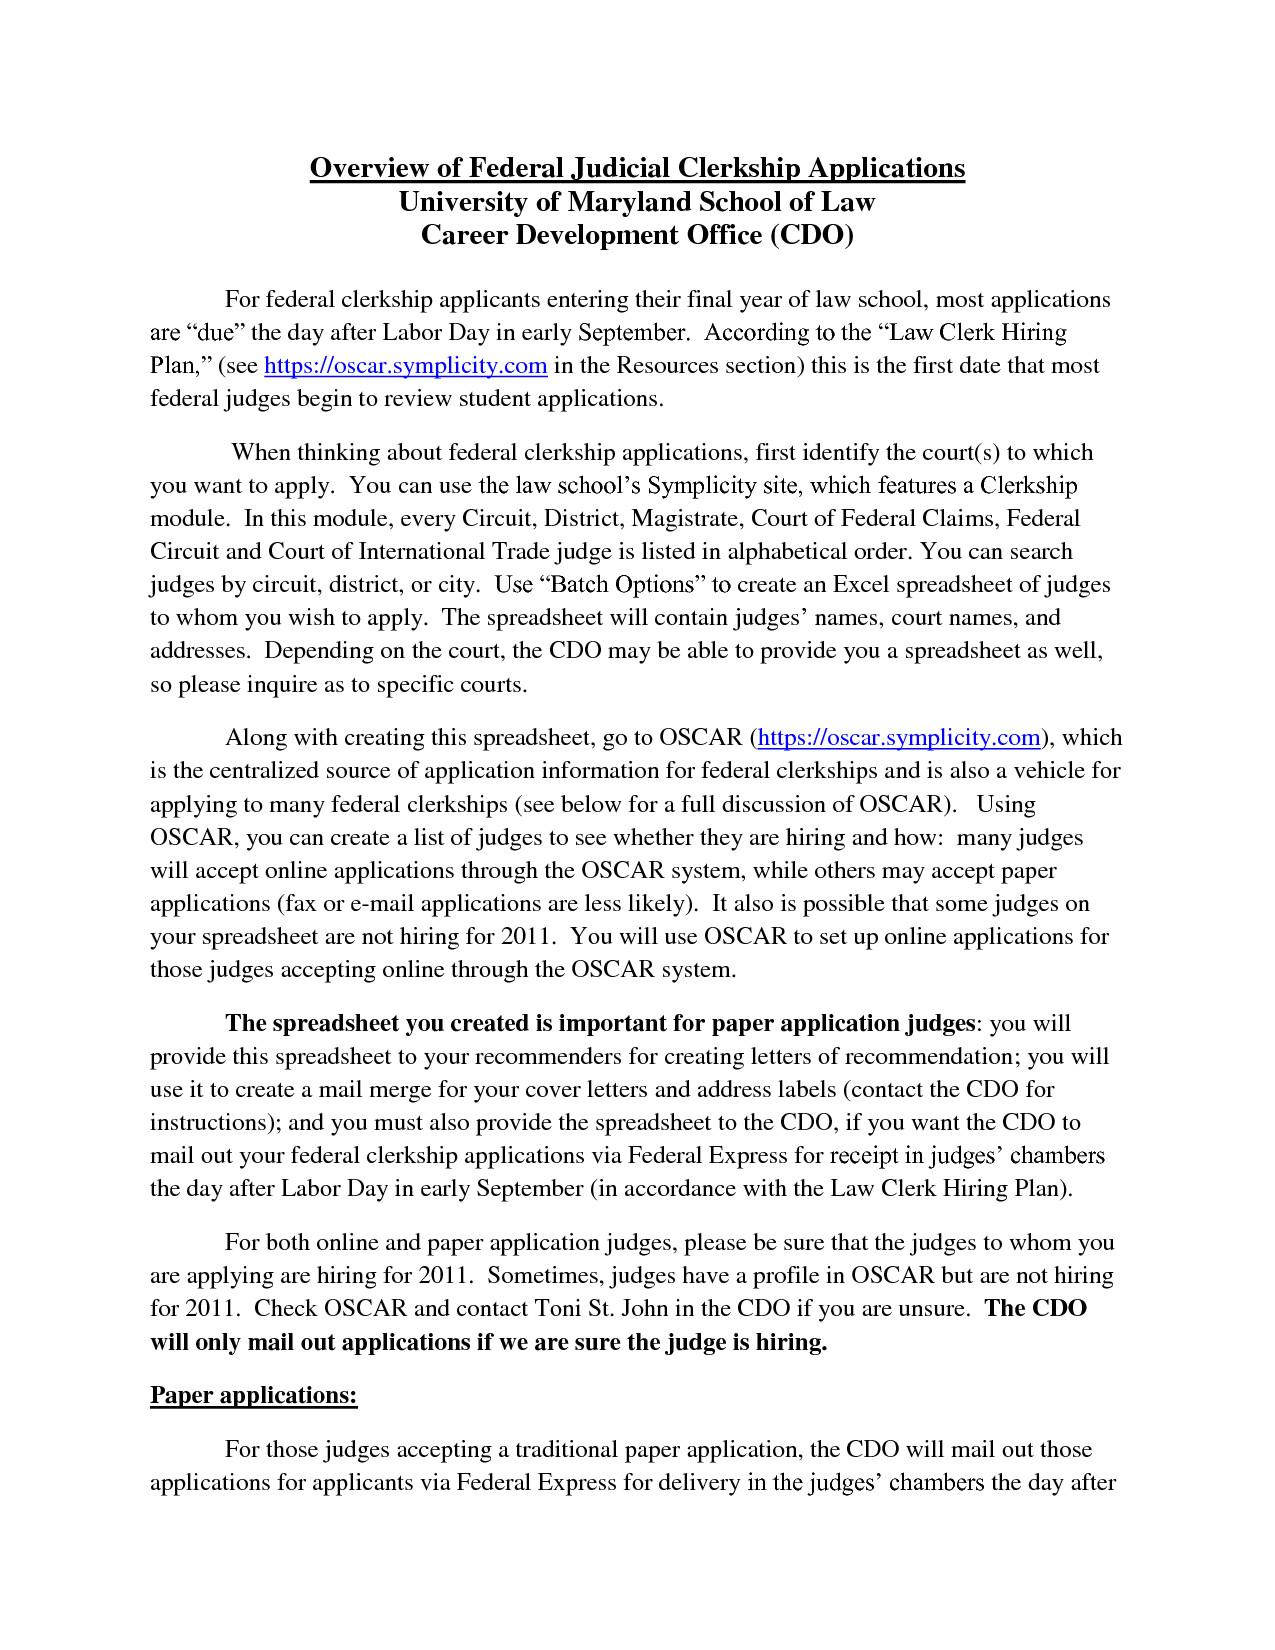 sample judicial externship cover letter